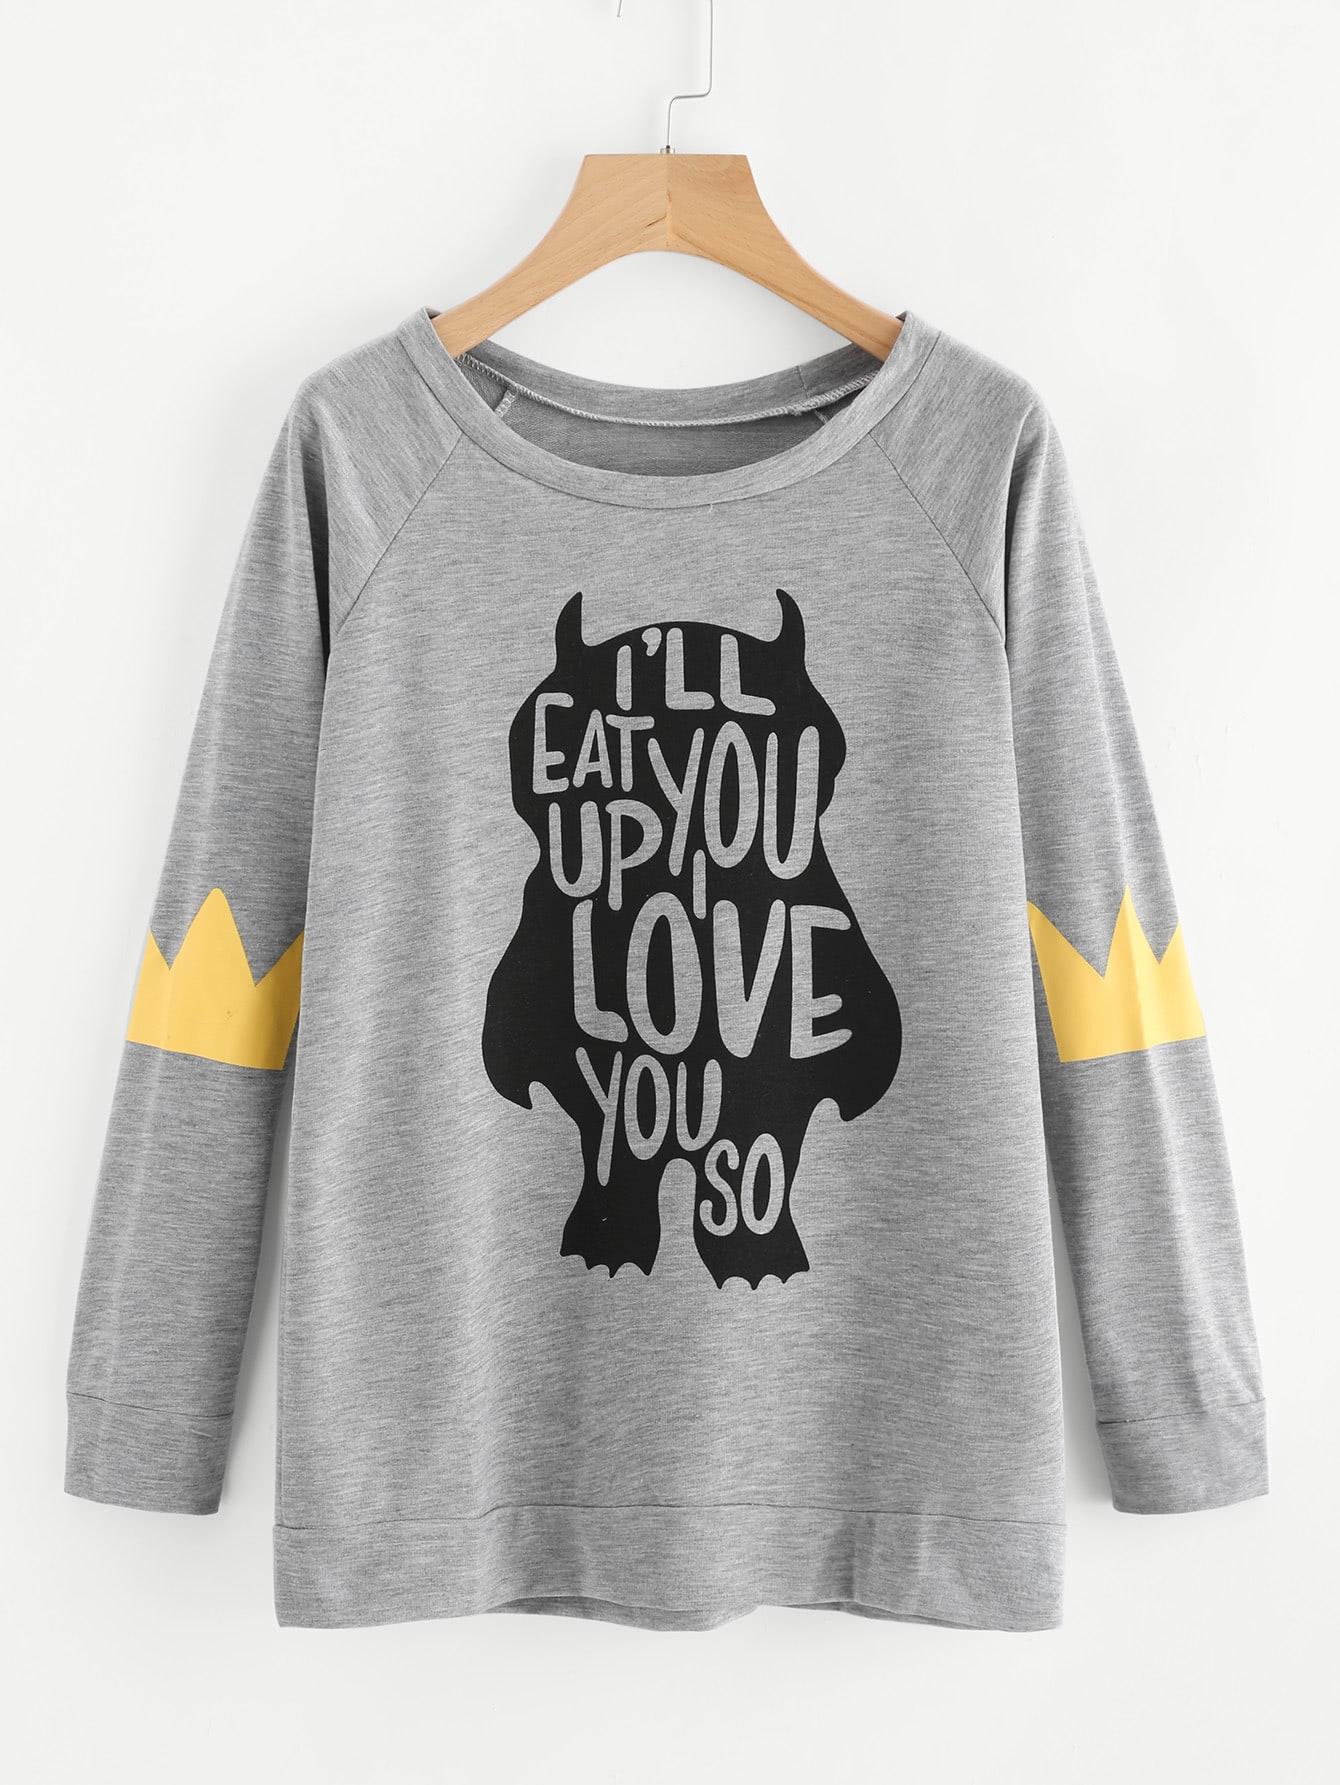 Slogan Print Marled Sweatshirt drop shoulder letter print marled crop sweatshirt